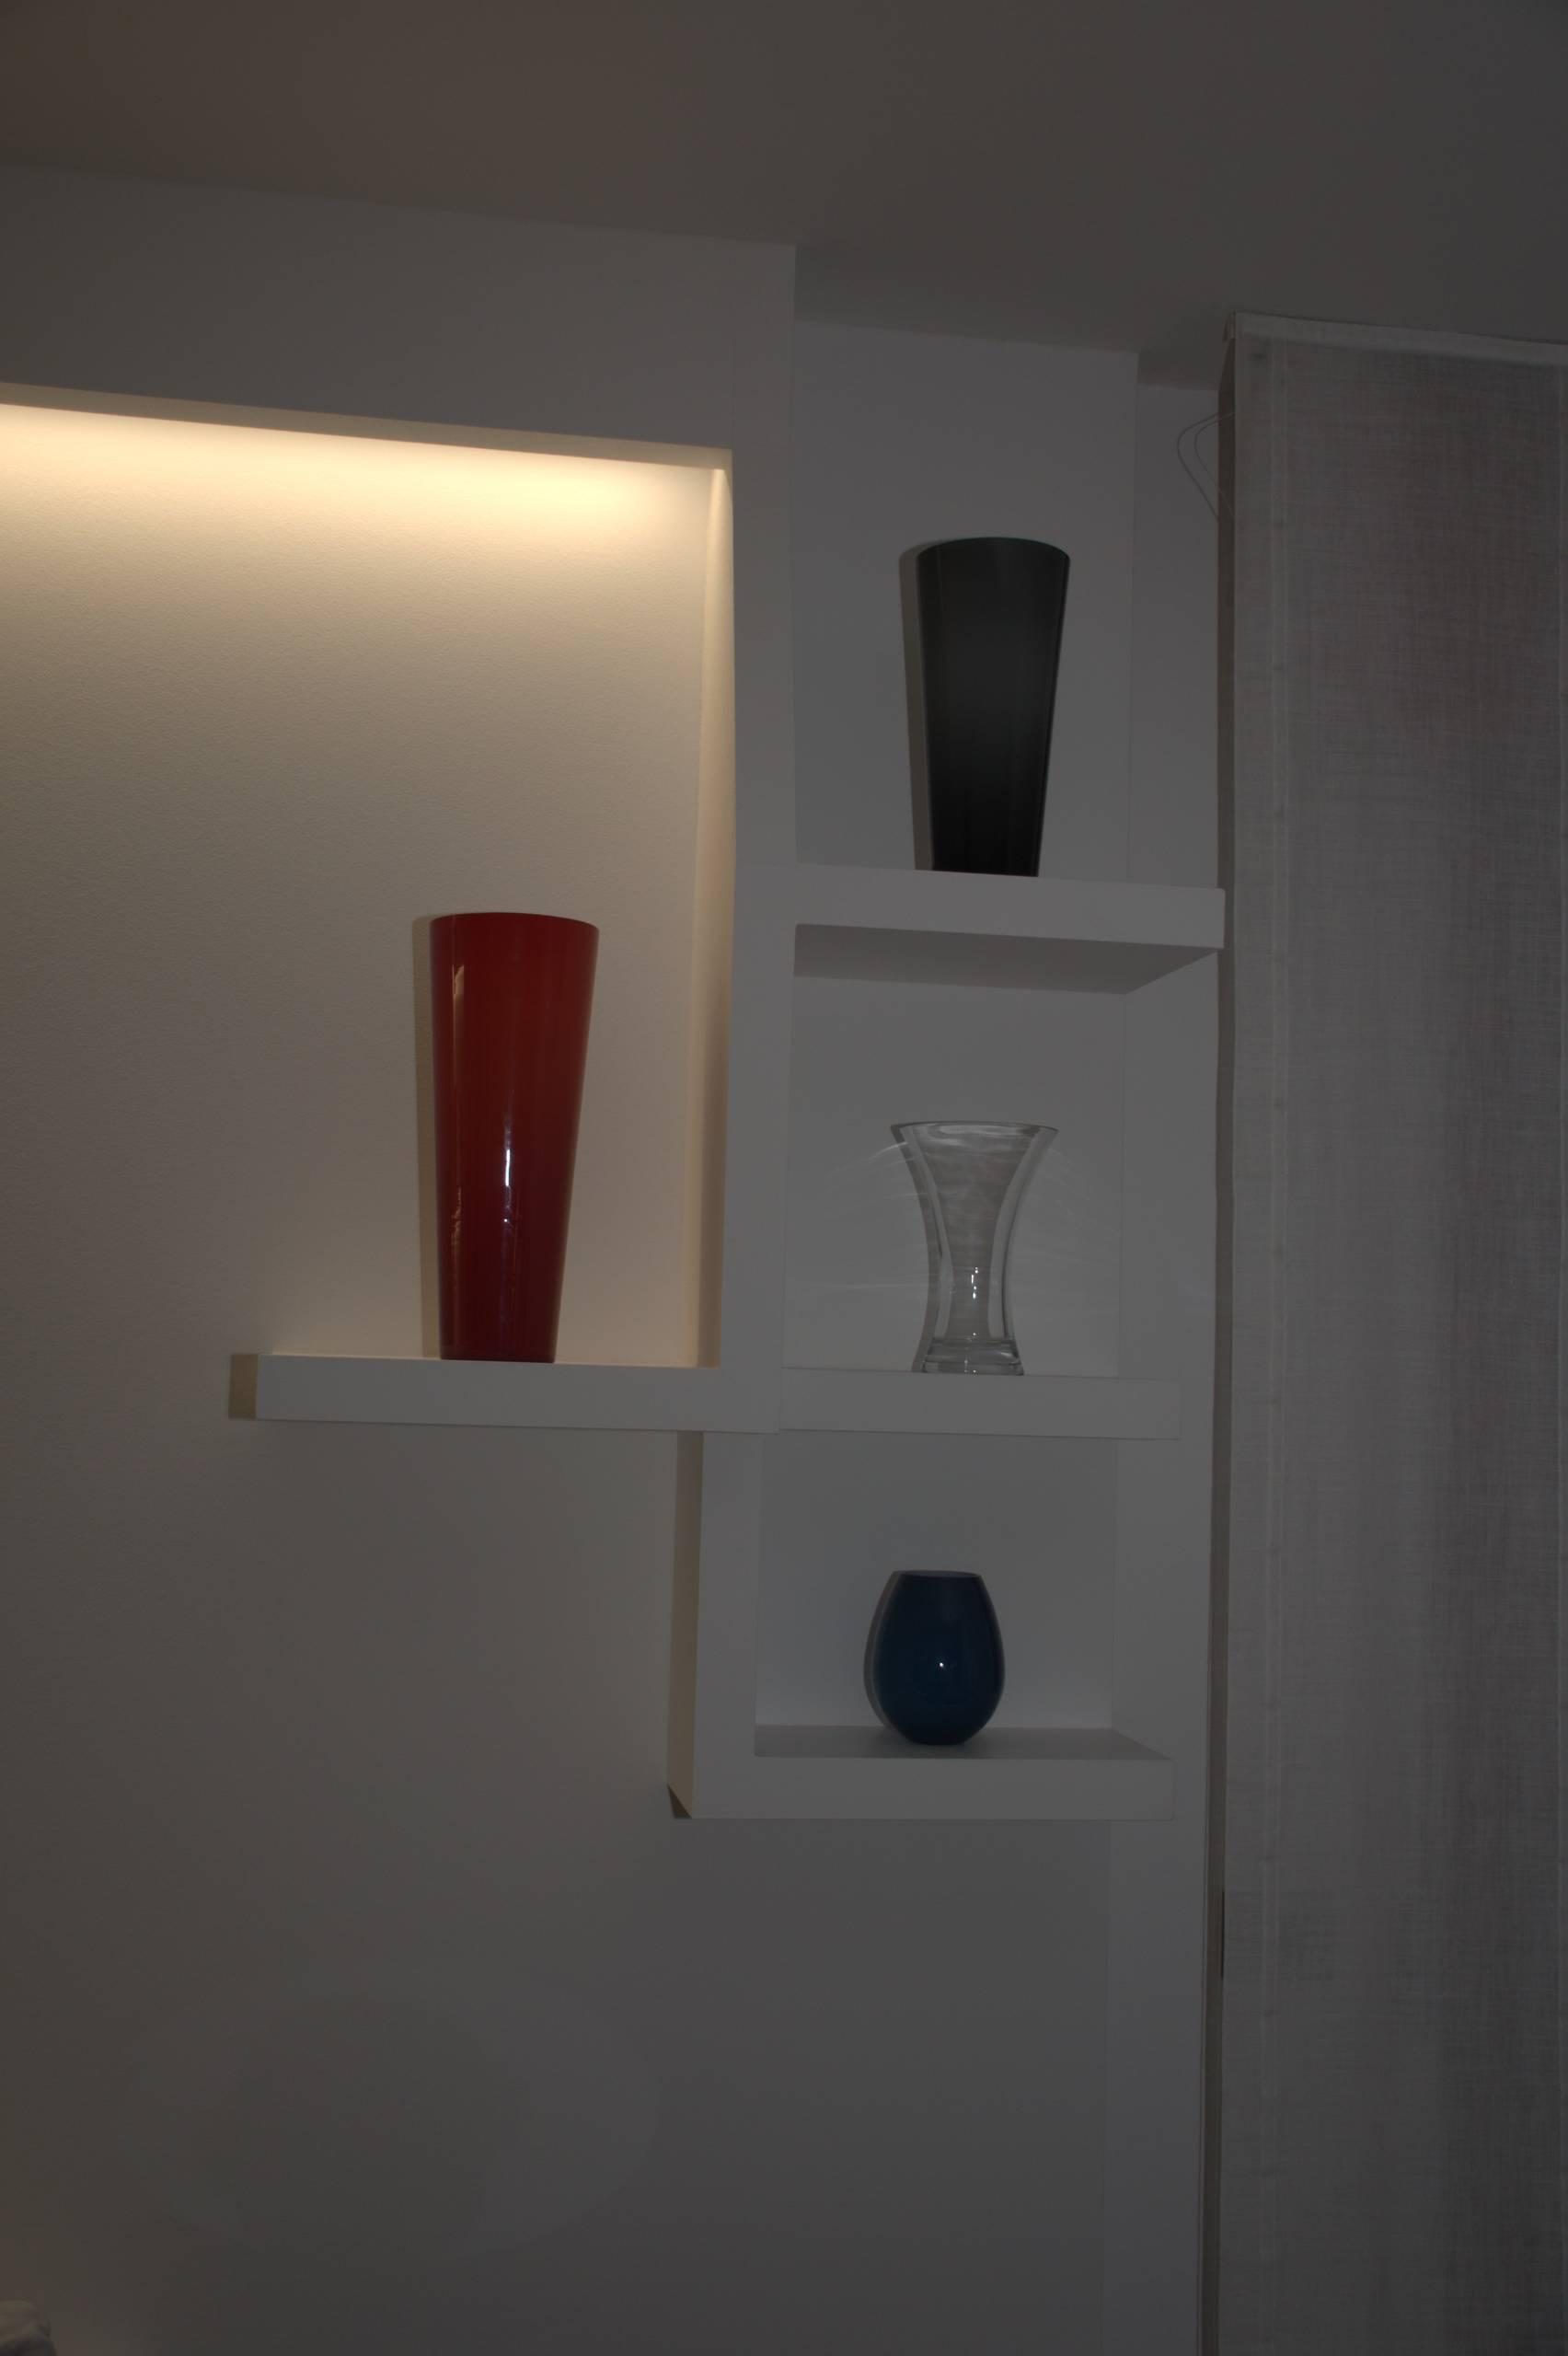 Progettazione arredi a Udine - 80 mq